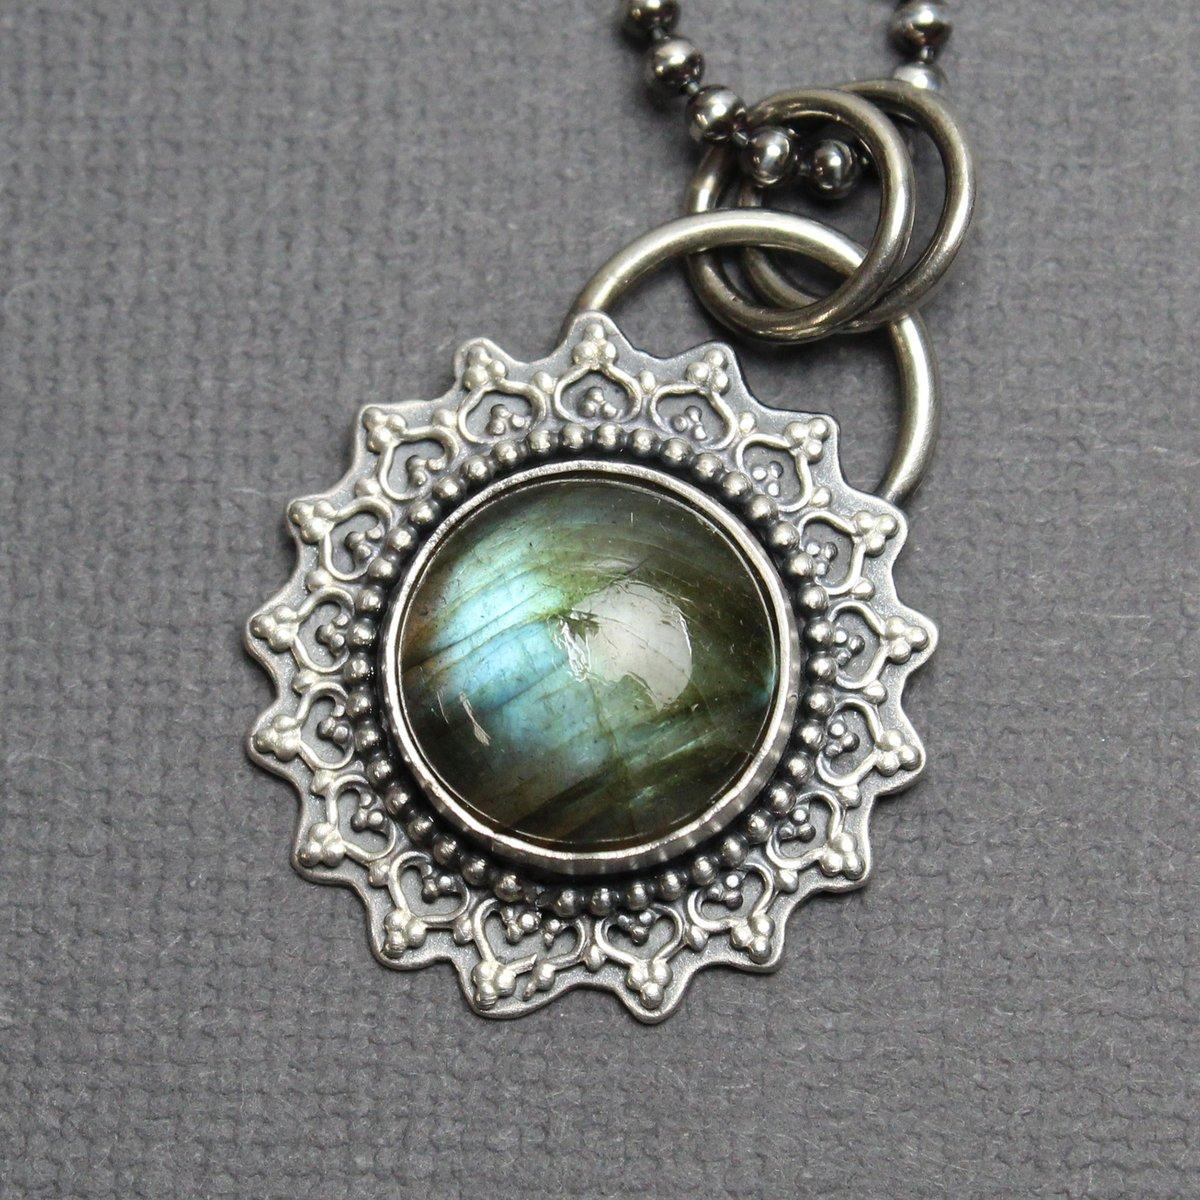 Labradorite Necklace in Sterling Silver 20 Inches Long  #labrradorite #artisanjewelry #metalsmith #texasartist #madeintexas #supporthandmade